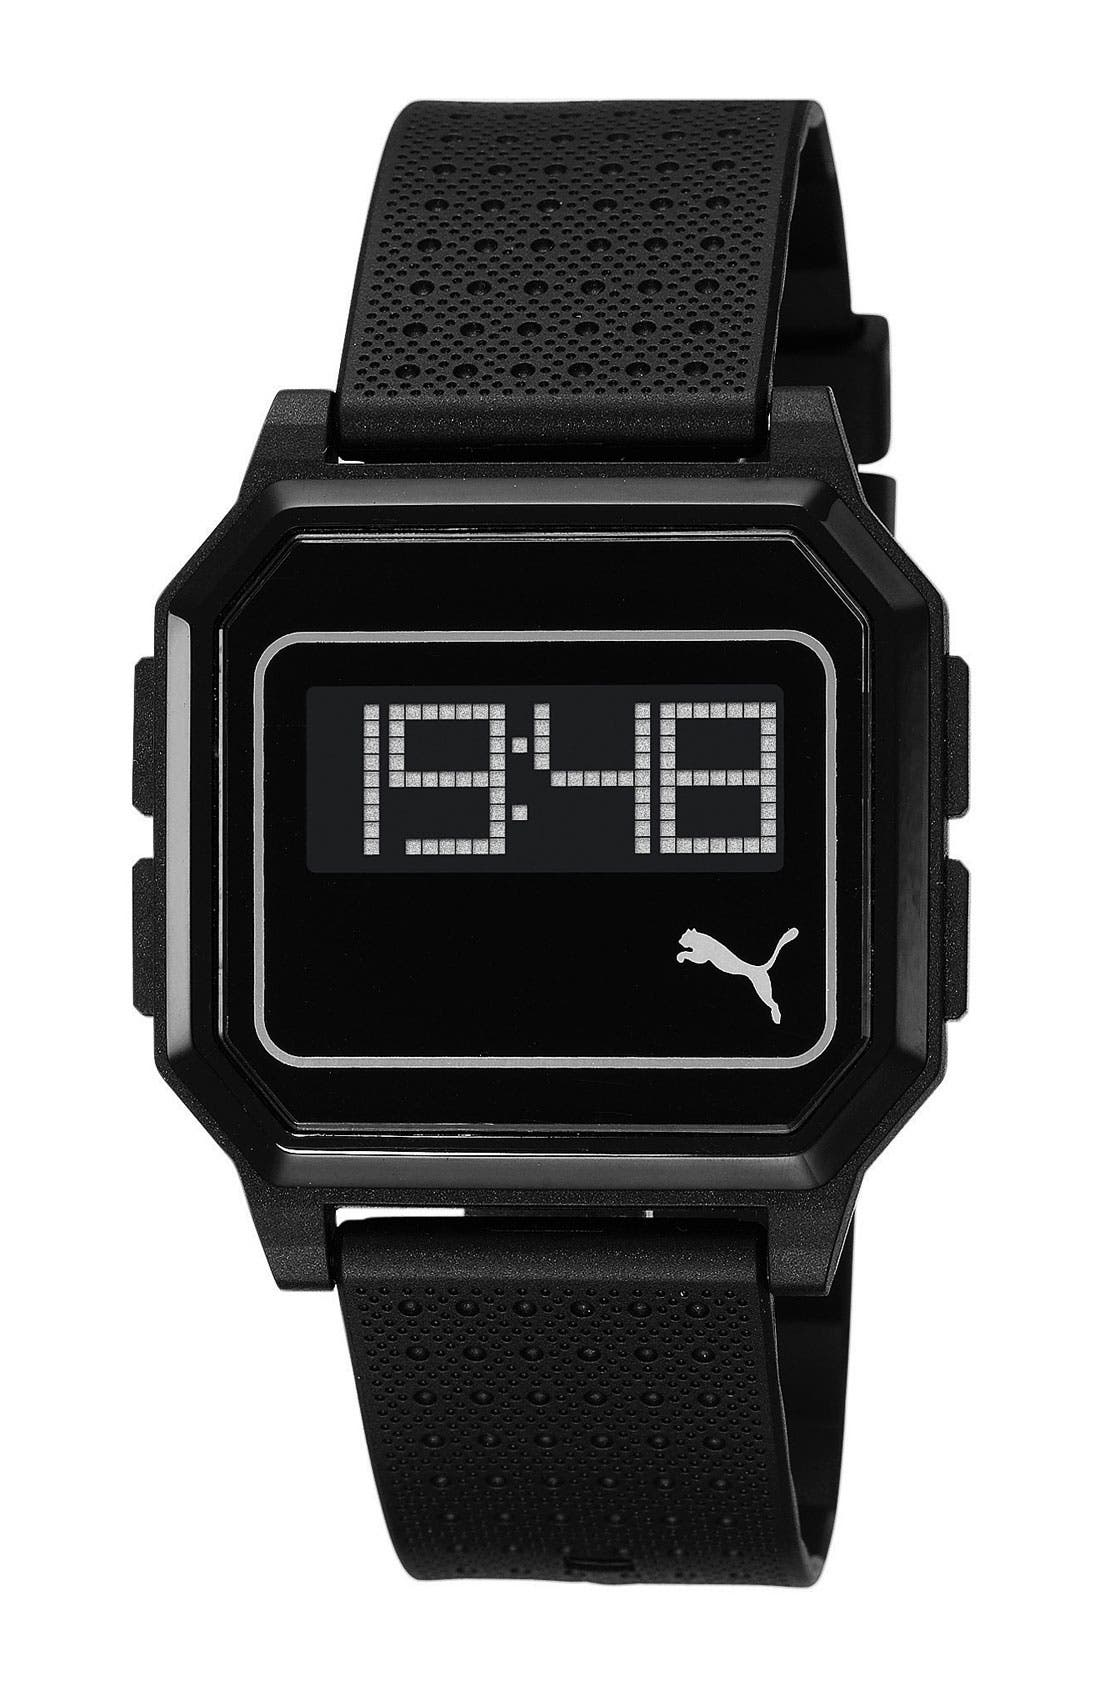 Main Image - PUMA Digital Watch, 36mm x 40mm